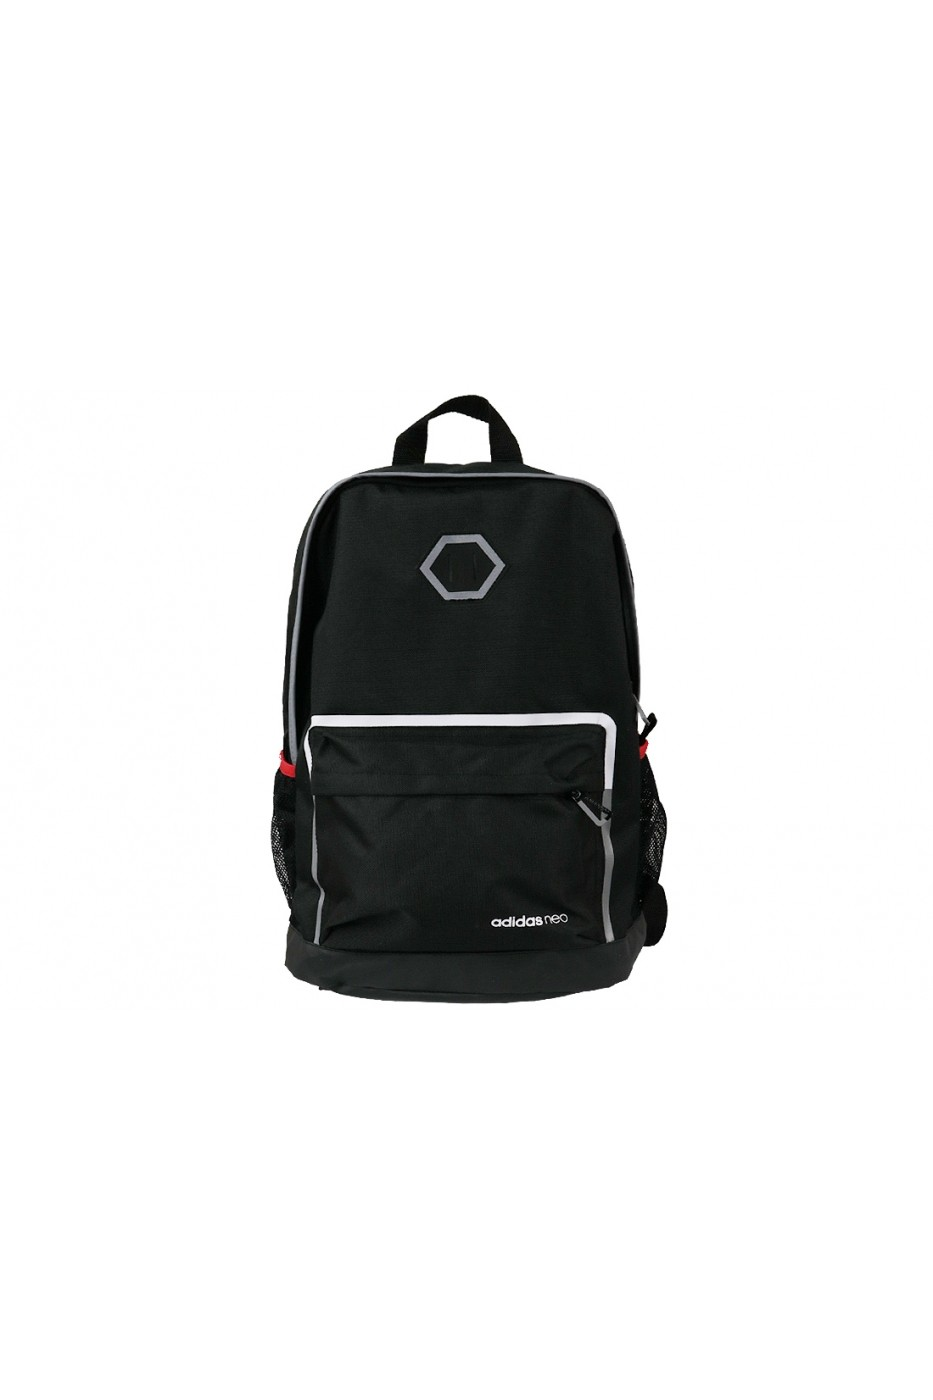 ad9f3b79273f Rucsac pentru barbati Adidas BP S Daily Backpack BQ1308 - FashionUP!